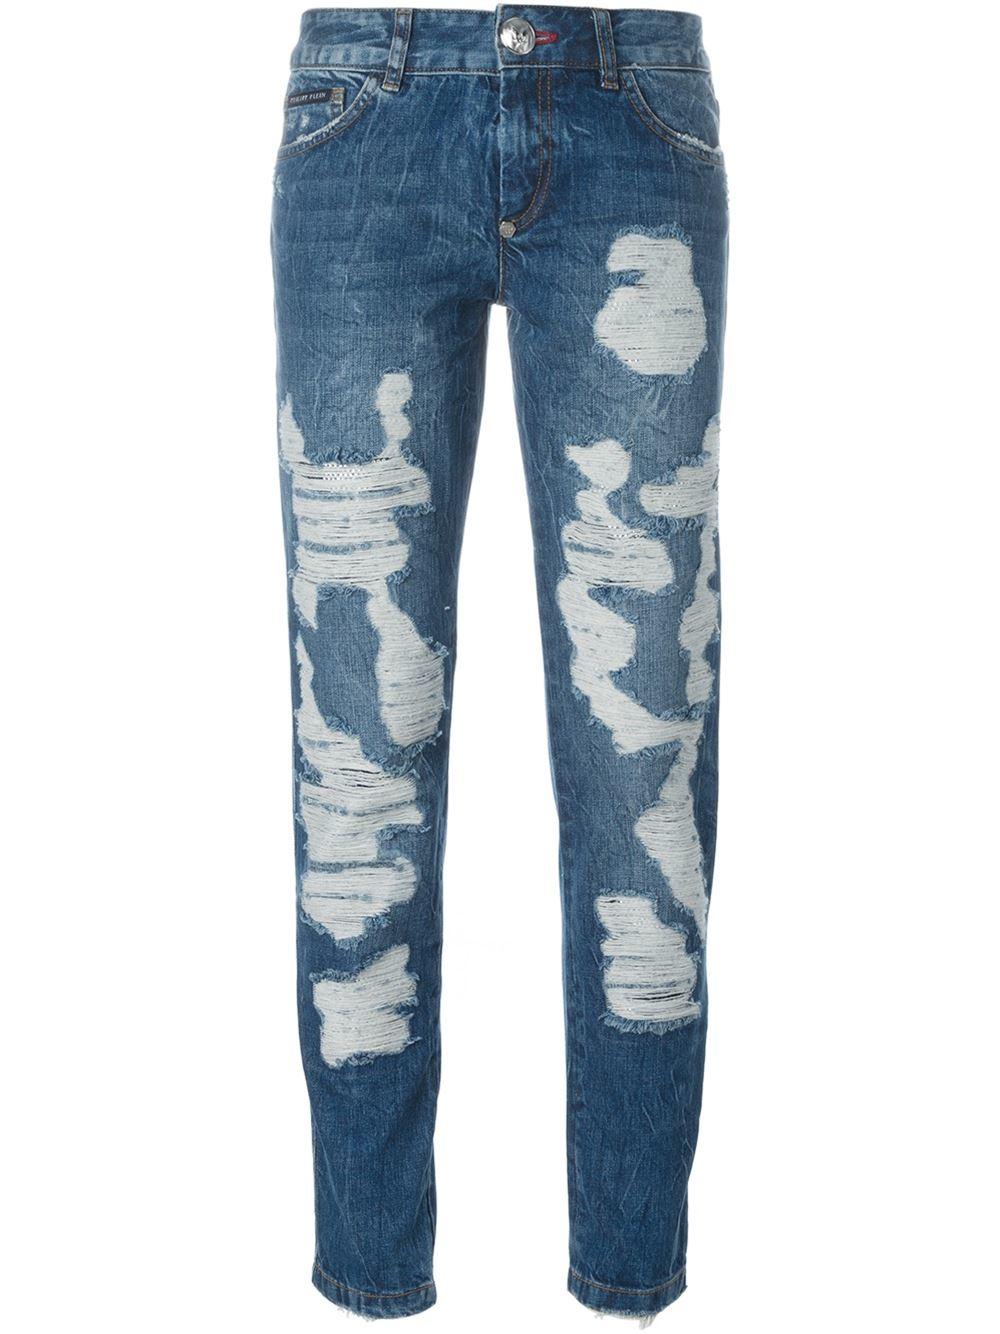 philipp plein 39 forgiveness 39 boyfriend jeans in blue lyst. Black Bedroom Furniture Sets. Home Design Ideas